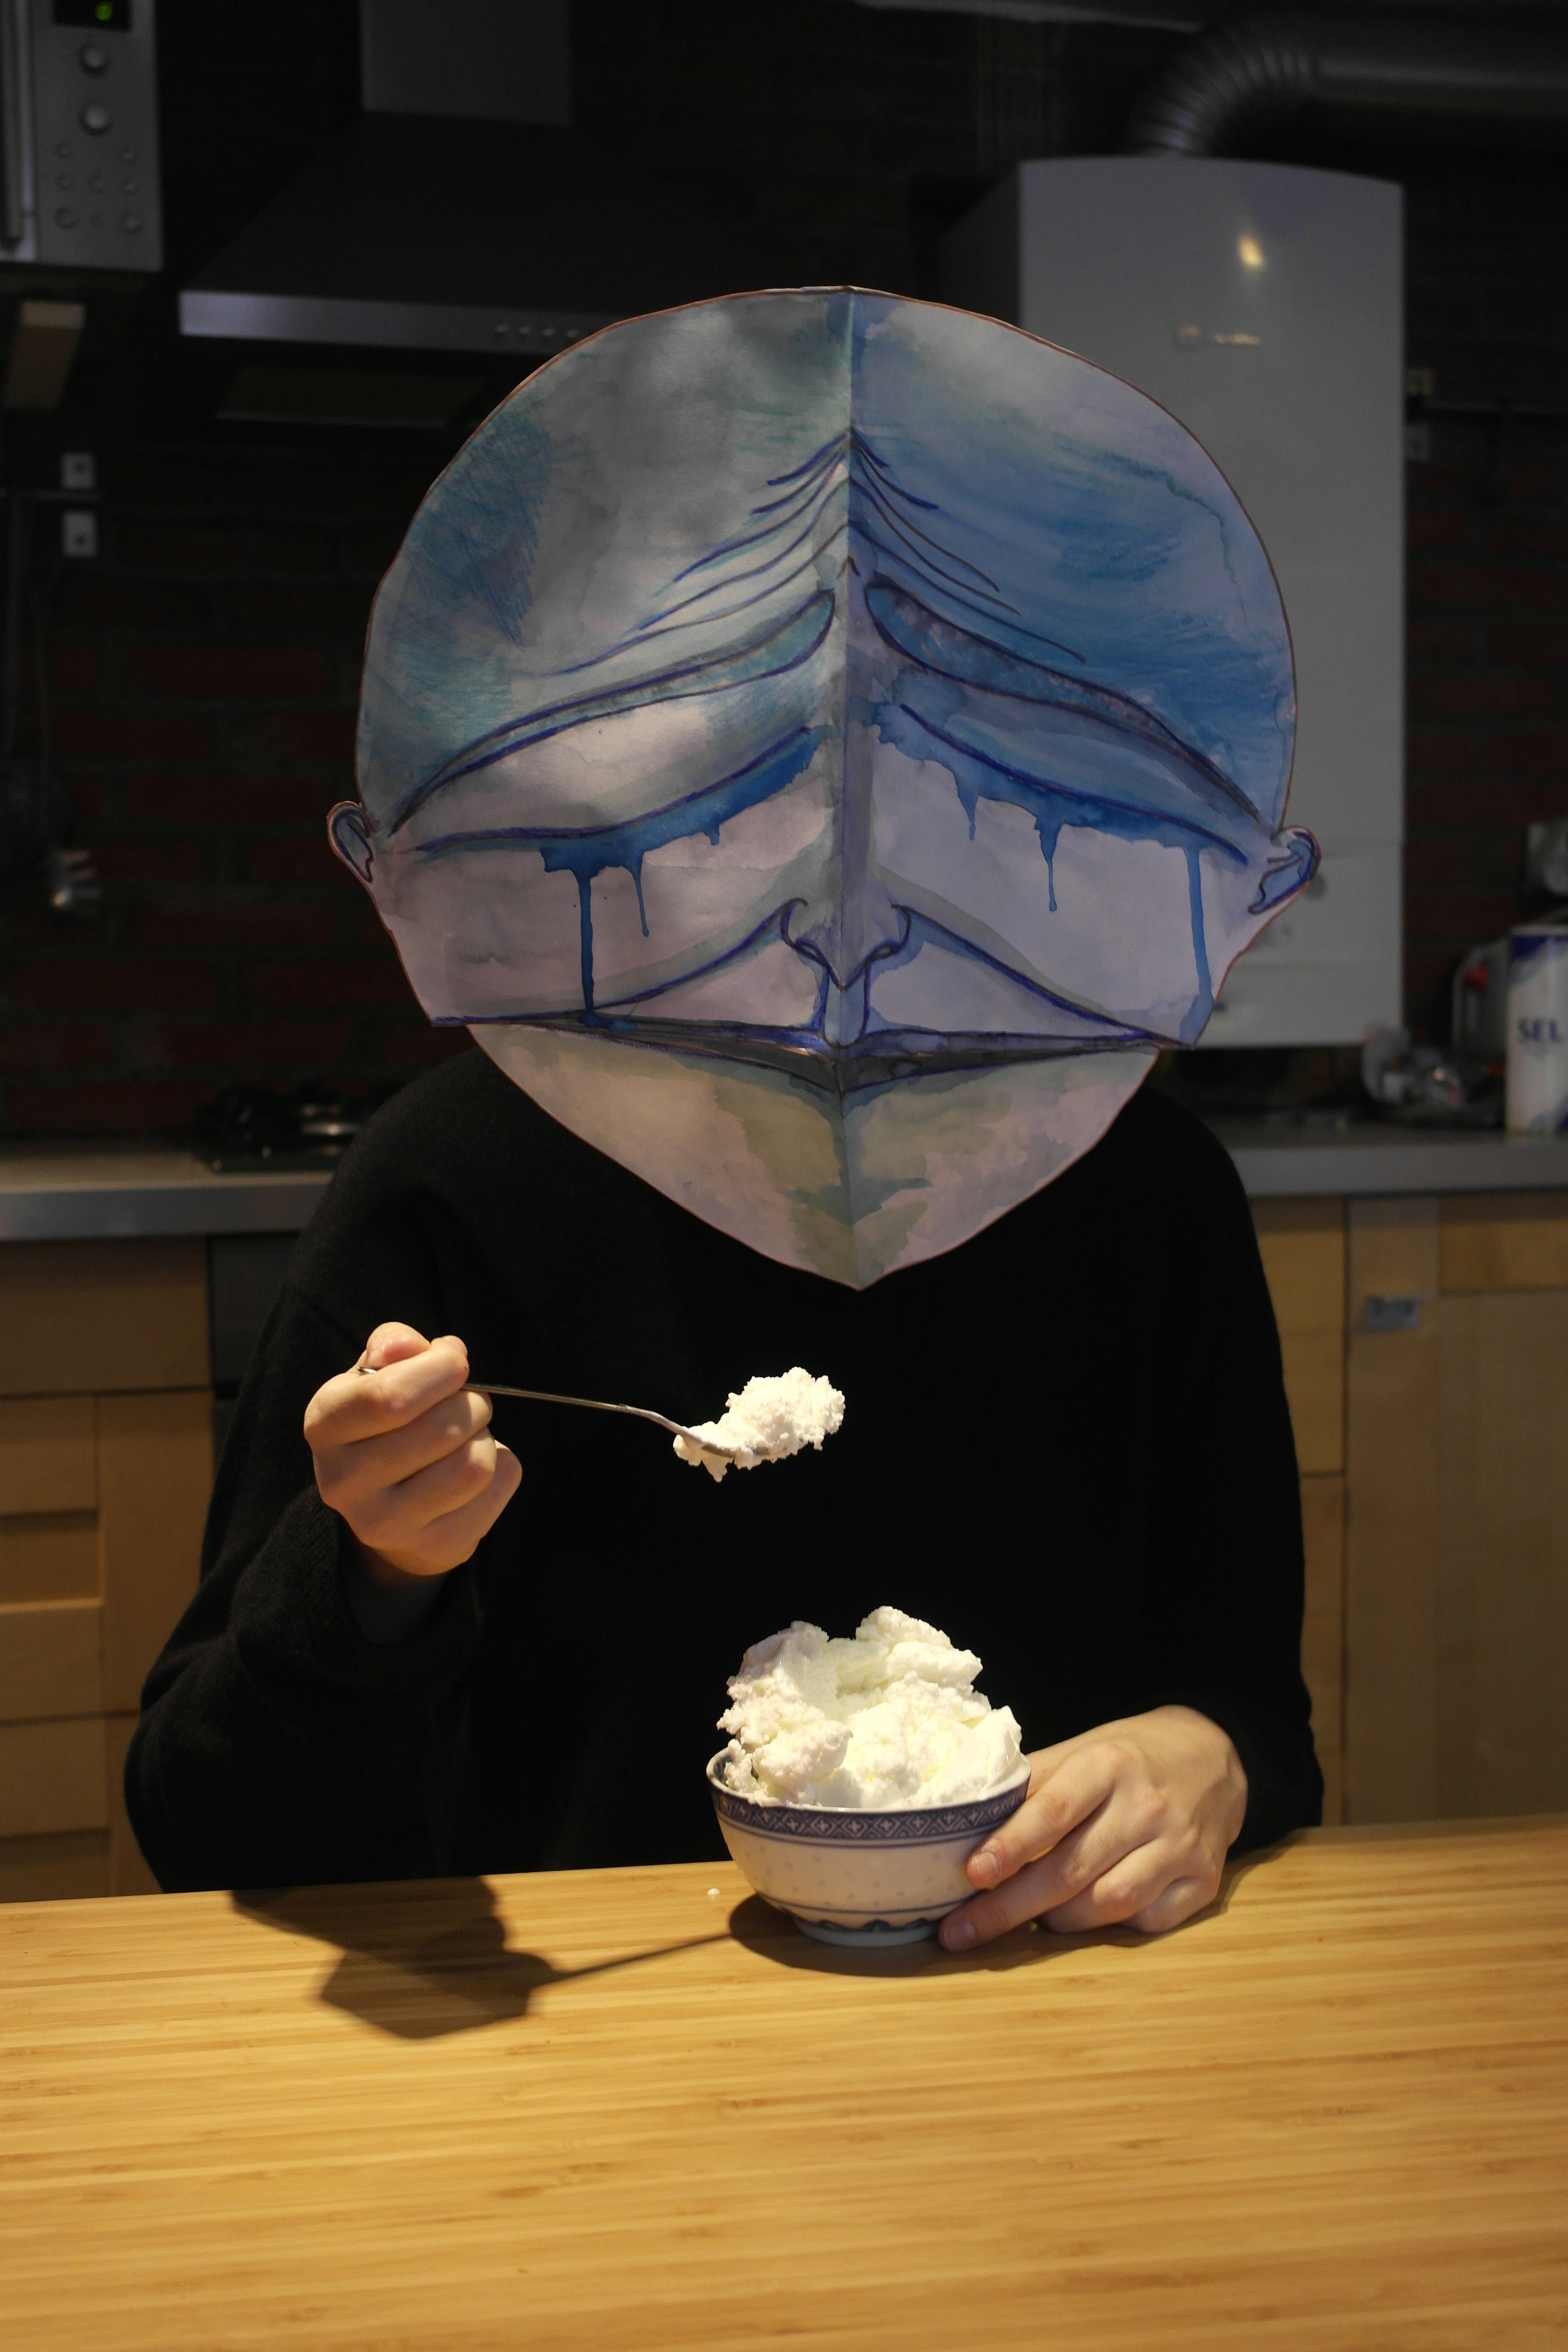 Ice Cream = Sadness